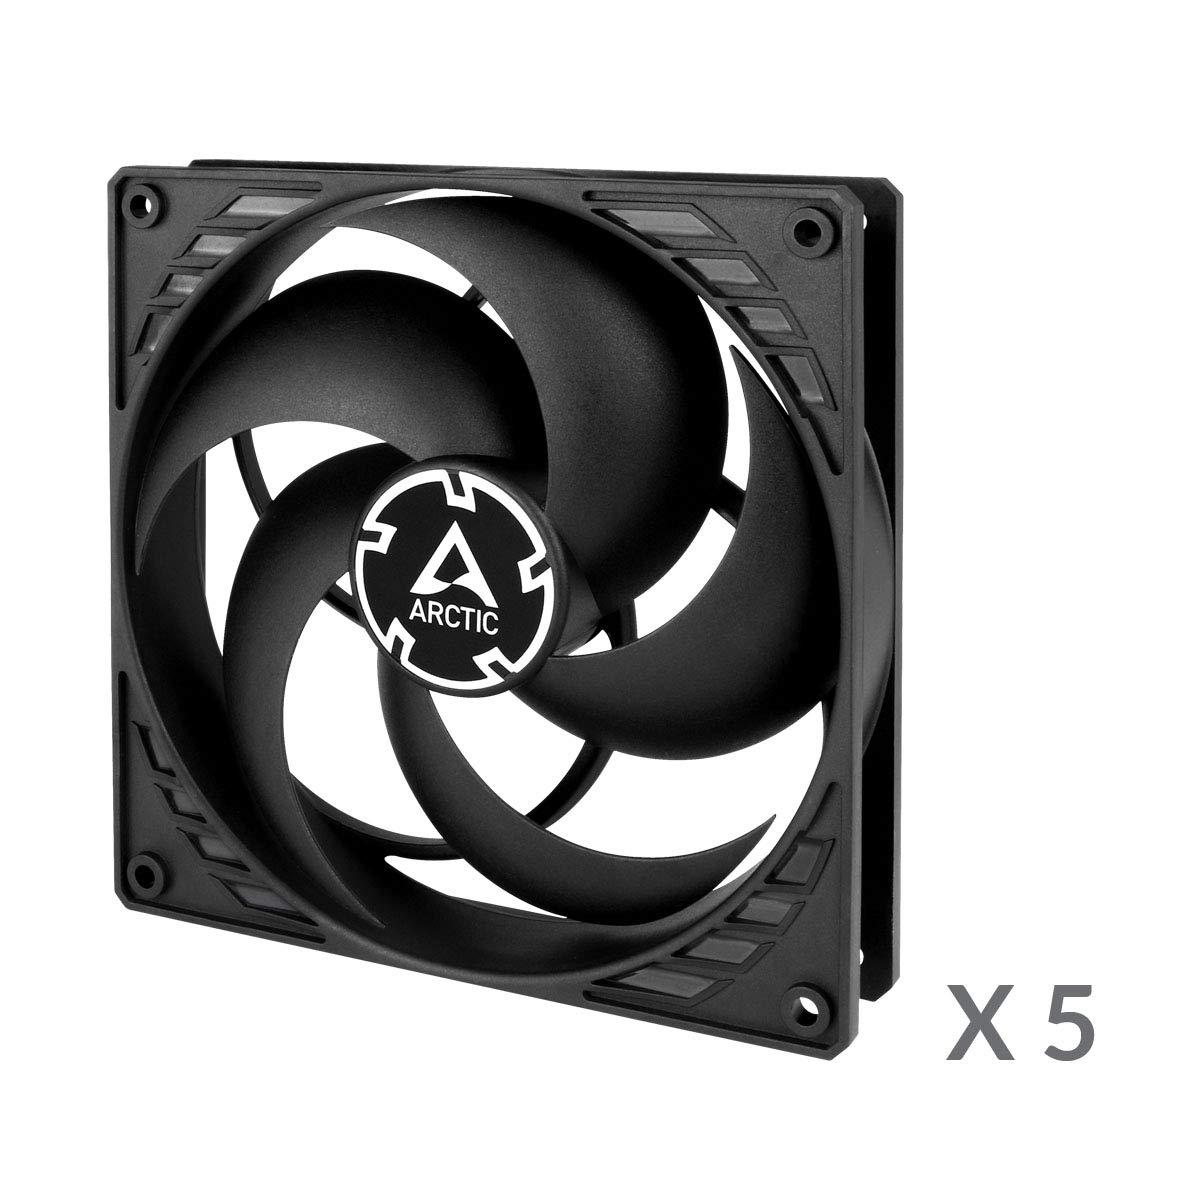 ARCTIC P14 PWM PST (5 piezas) - 140 mm Ventilador de Caja para CPU con PWM Sharing Technology (PST), Motor Muy Silencioso, Computadora, 200-1700 RPM - Negro/Negro: Amazon.es: Informática